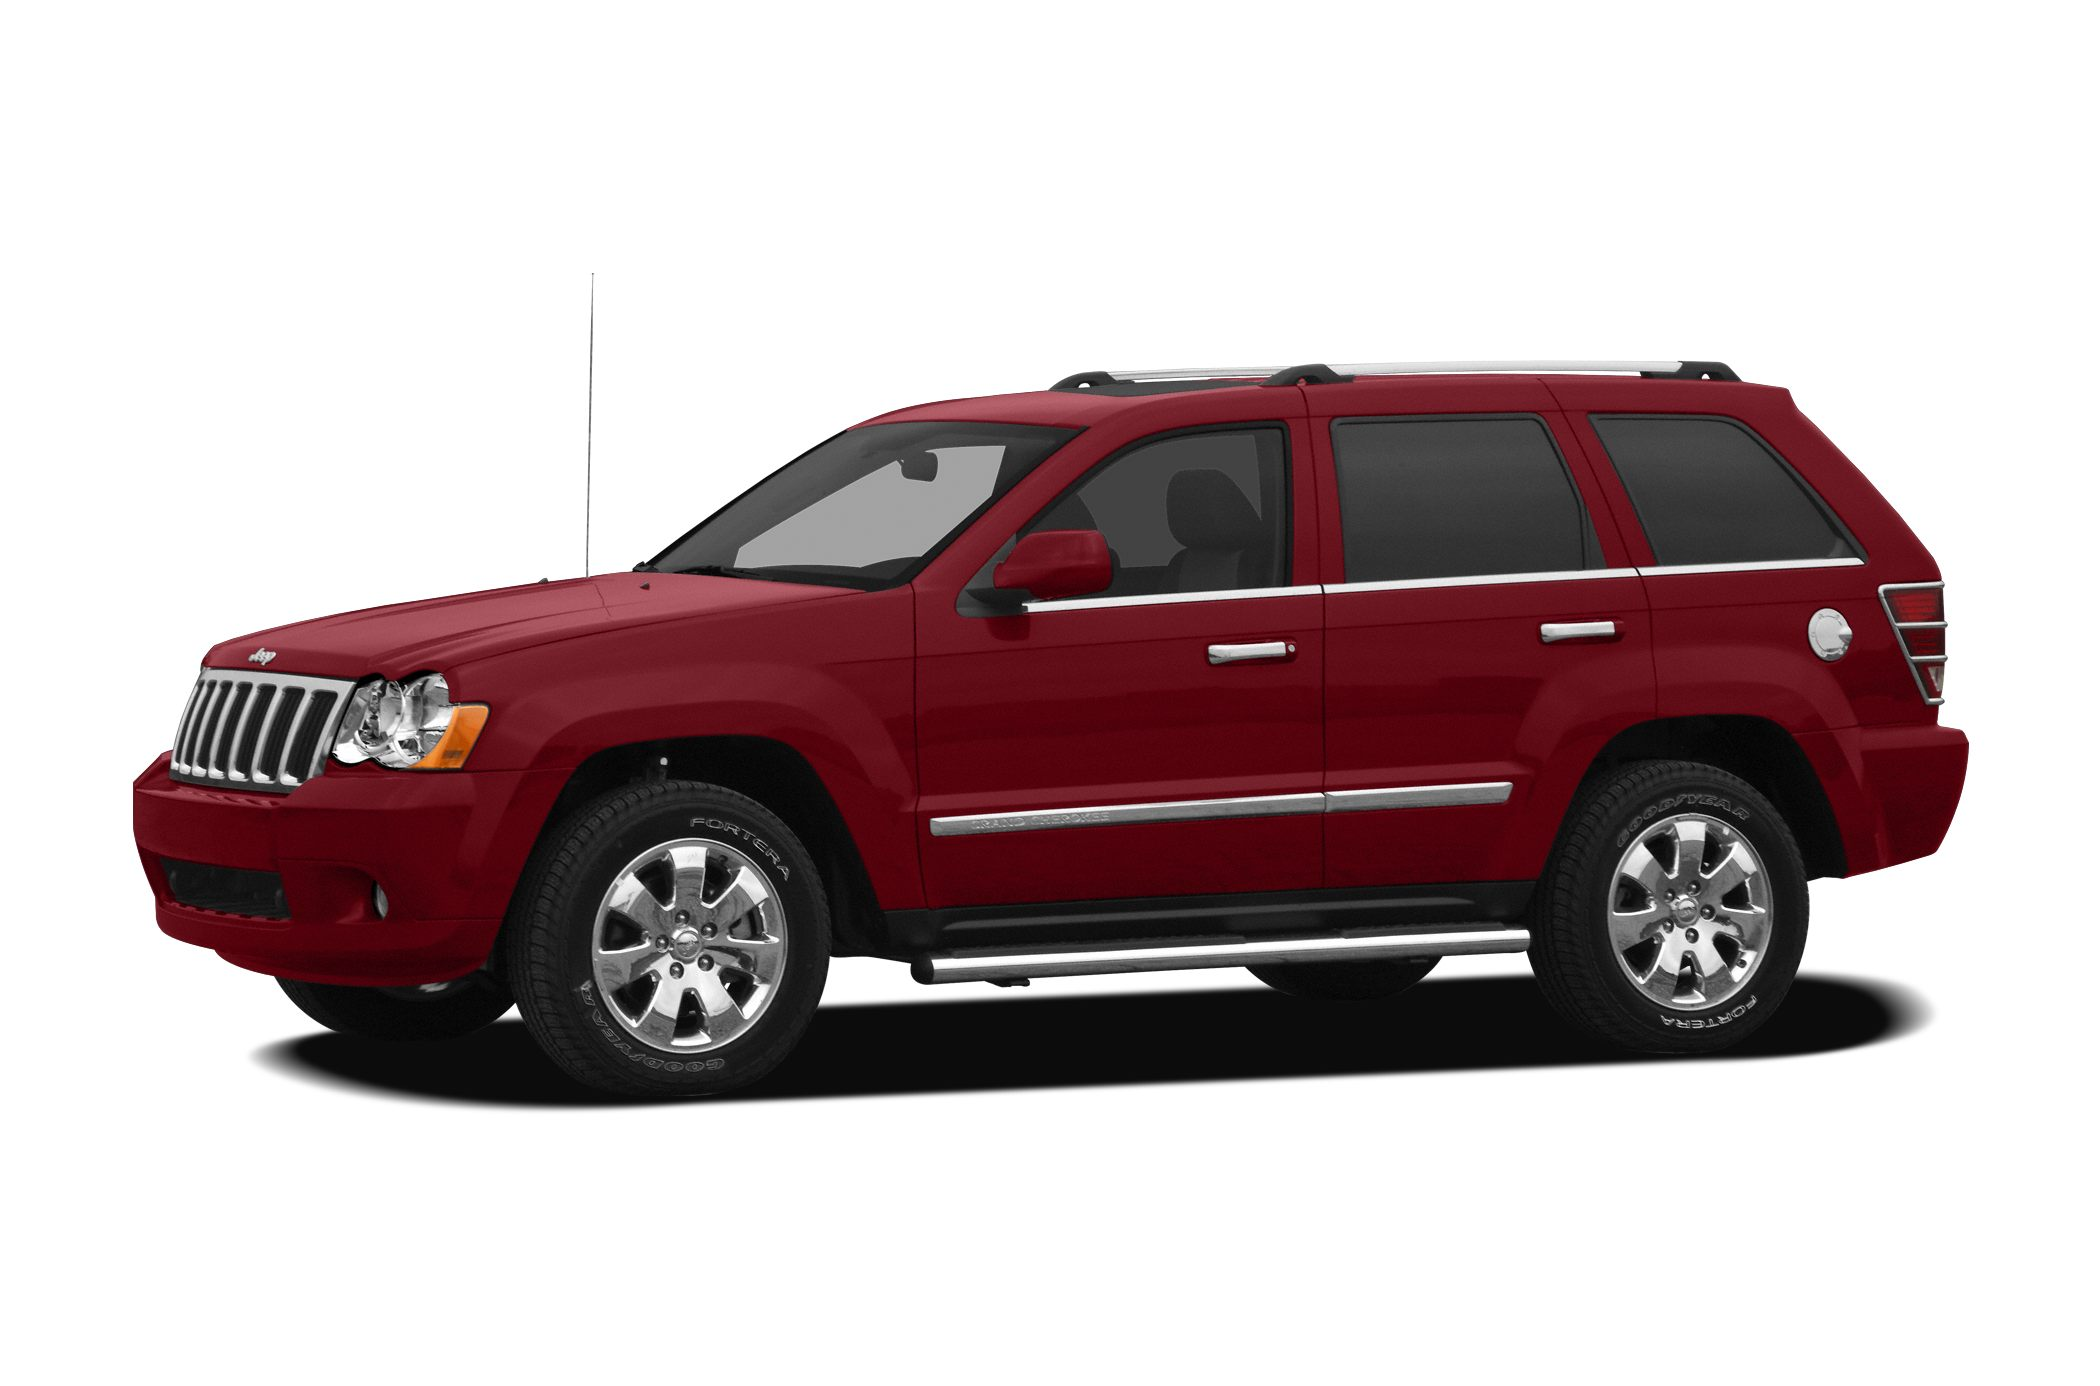 2008 Jeep Grand Cherokee Recalls